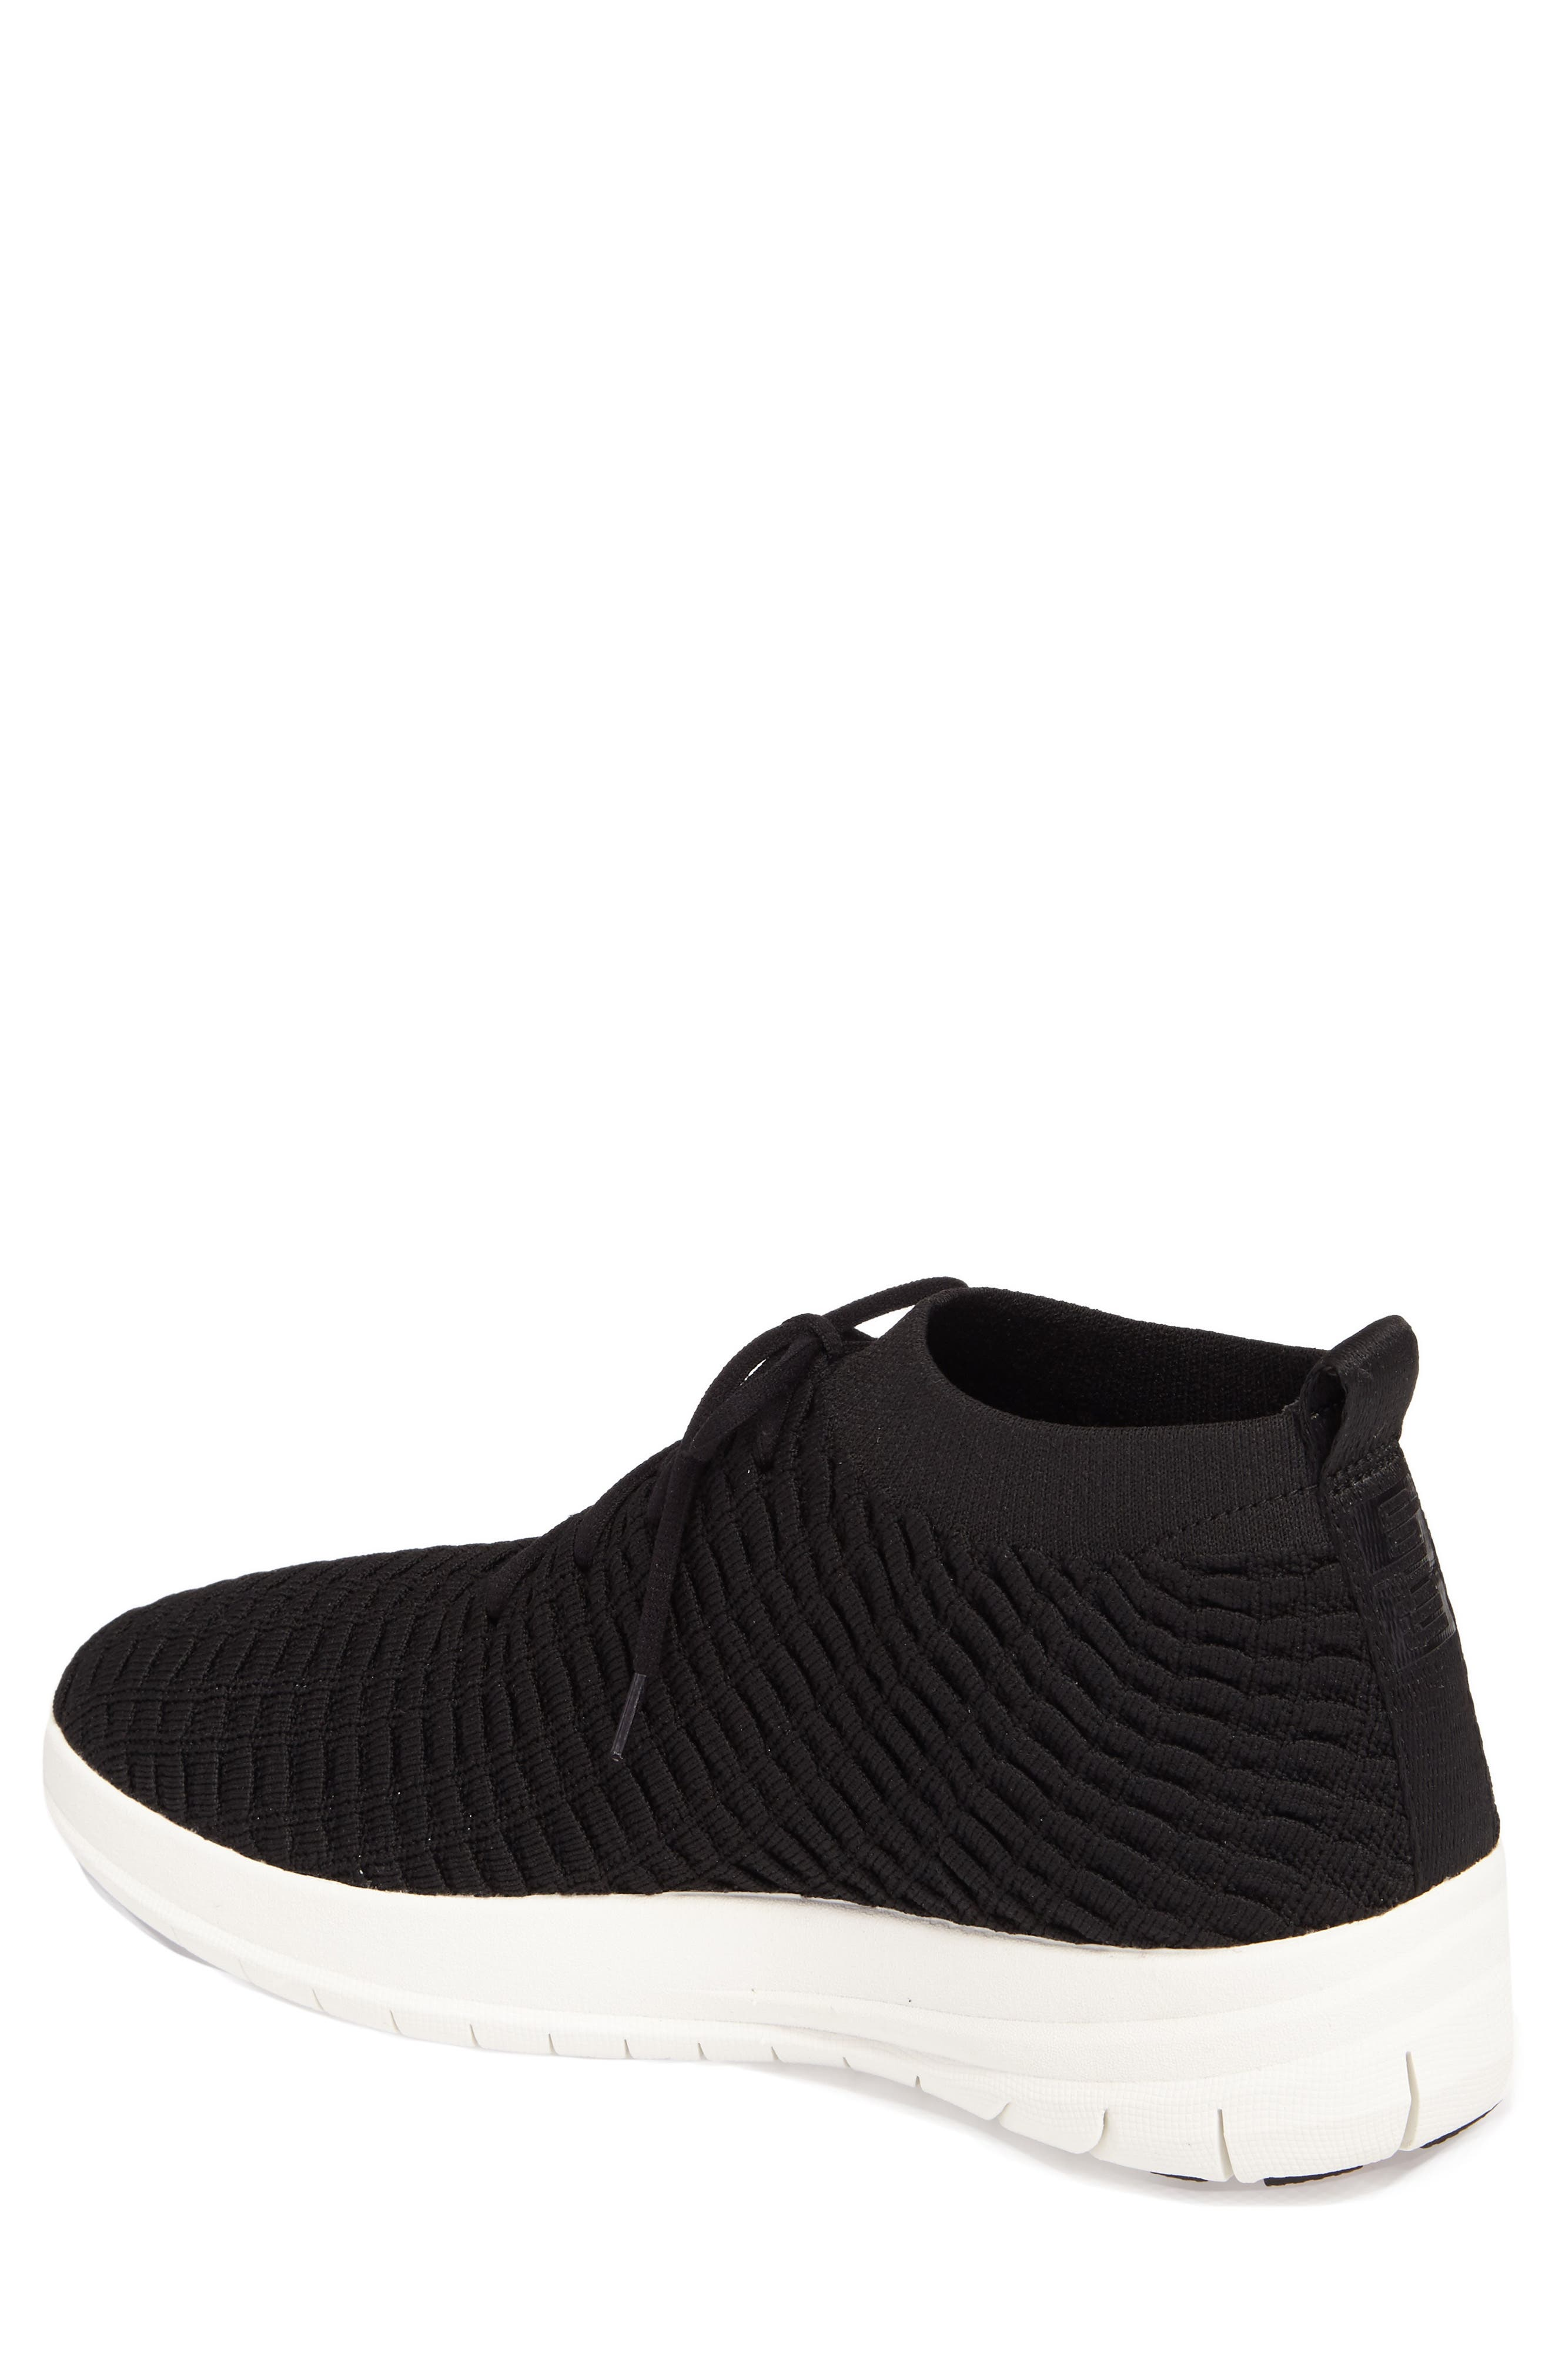 Uberknit Sneaker,                             Alternate thumbnail 2, color,                             Black Textile